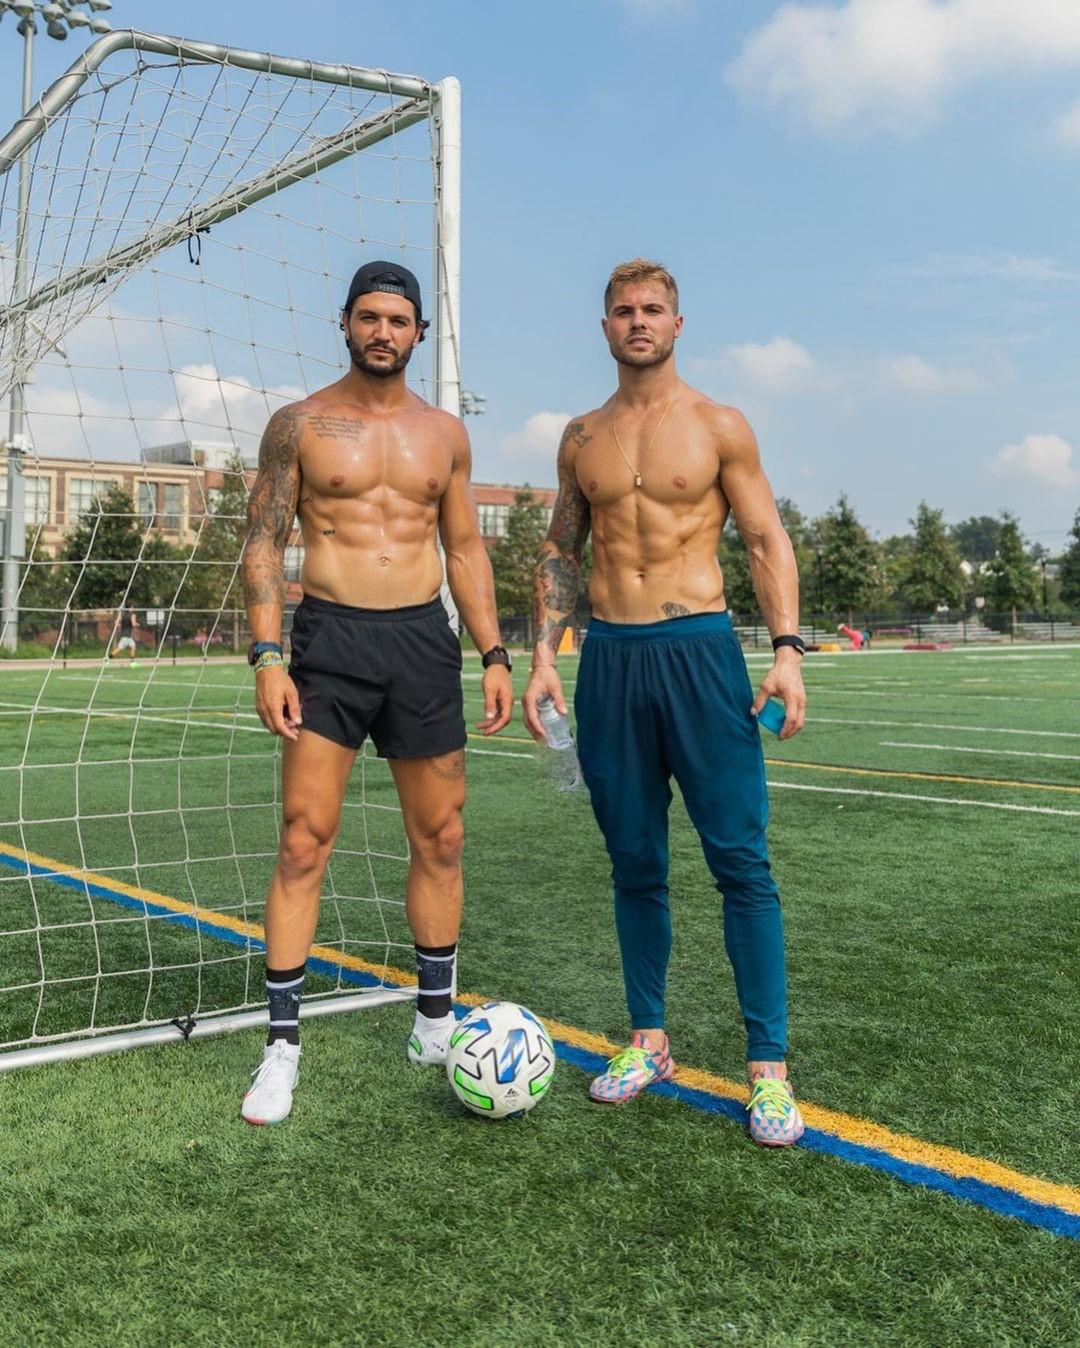 hot-shirtless-jocks-devon-levesque-sweaty-muscular-body-hunky-soccer-players